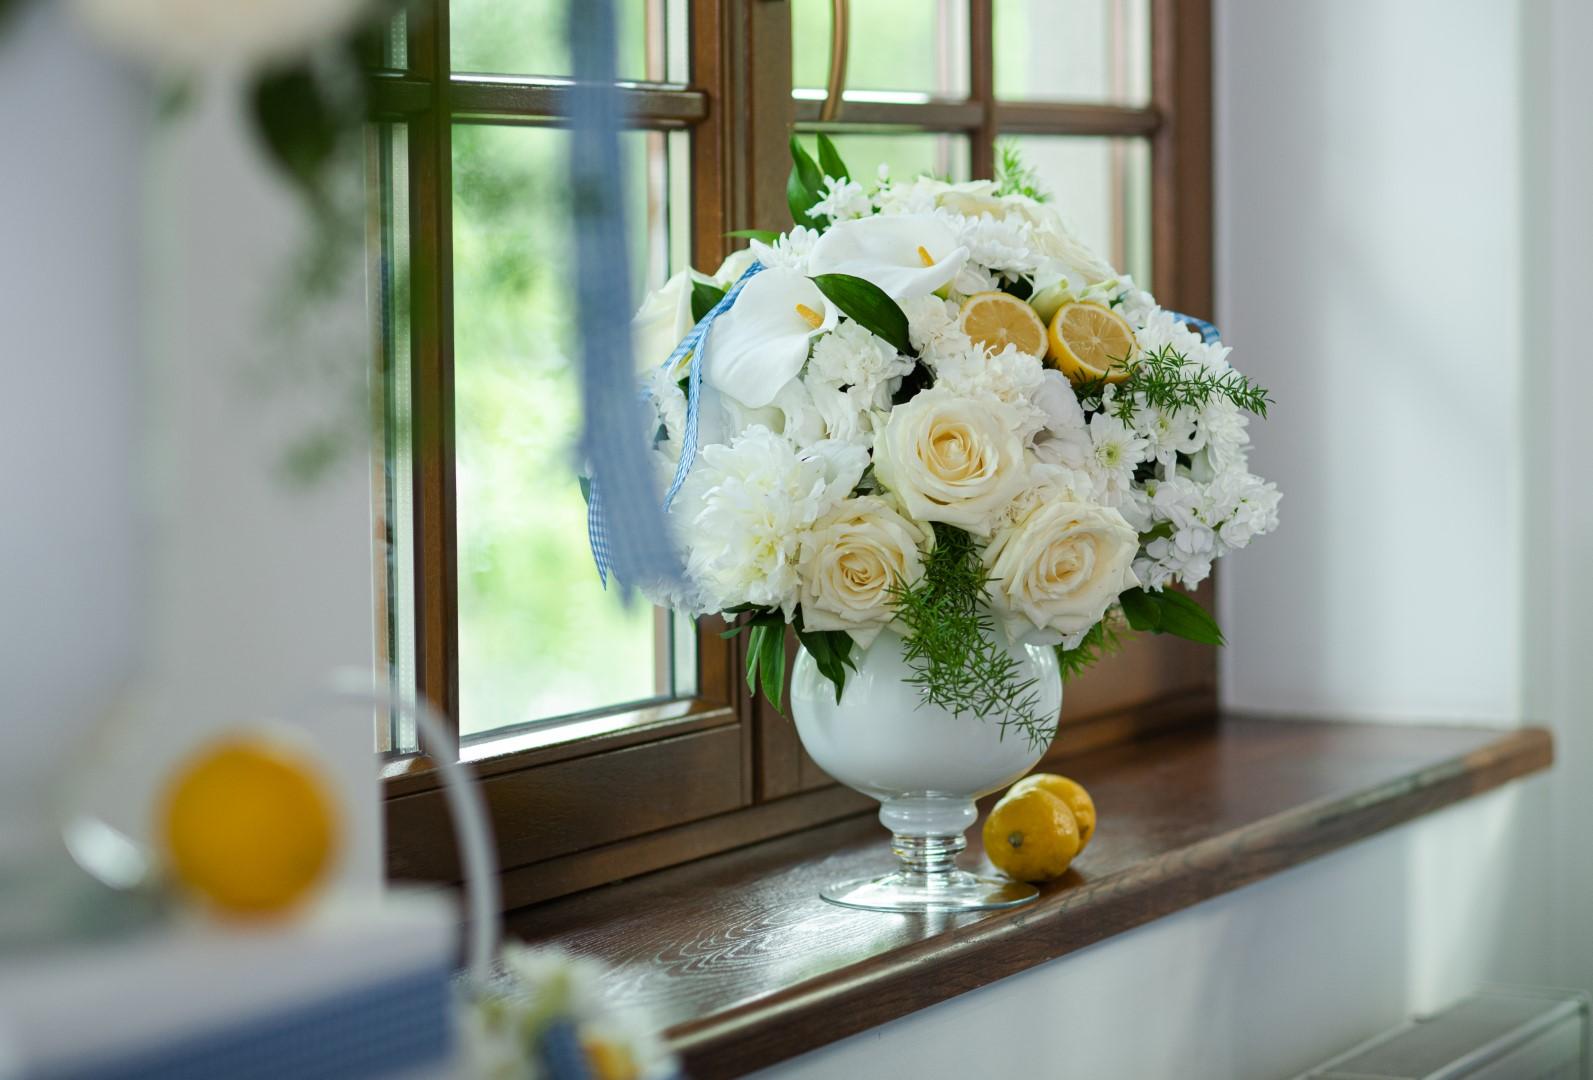 róża rose Avalanche+ chryzantema chrysanthemum Pina Colada ślub wedding